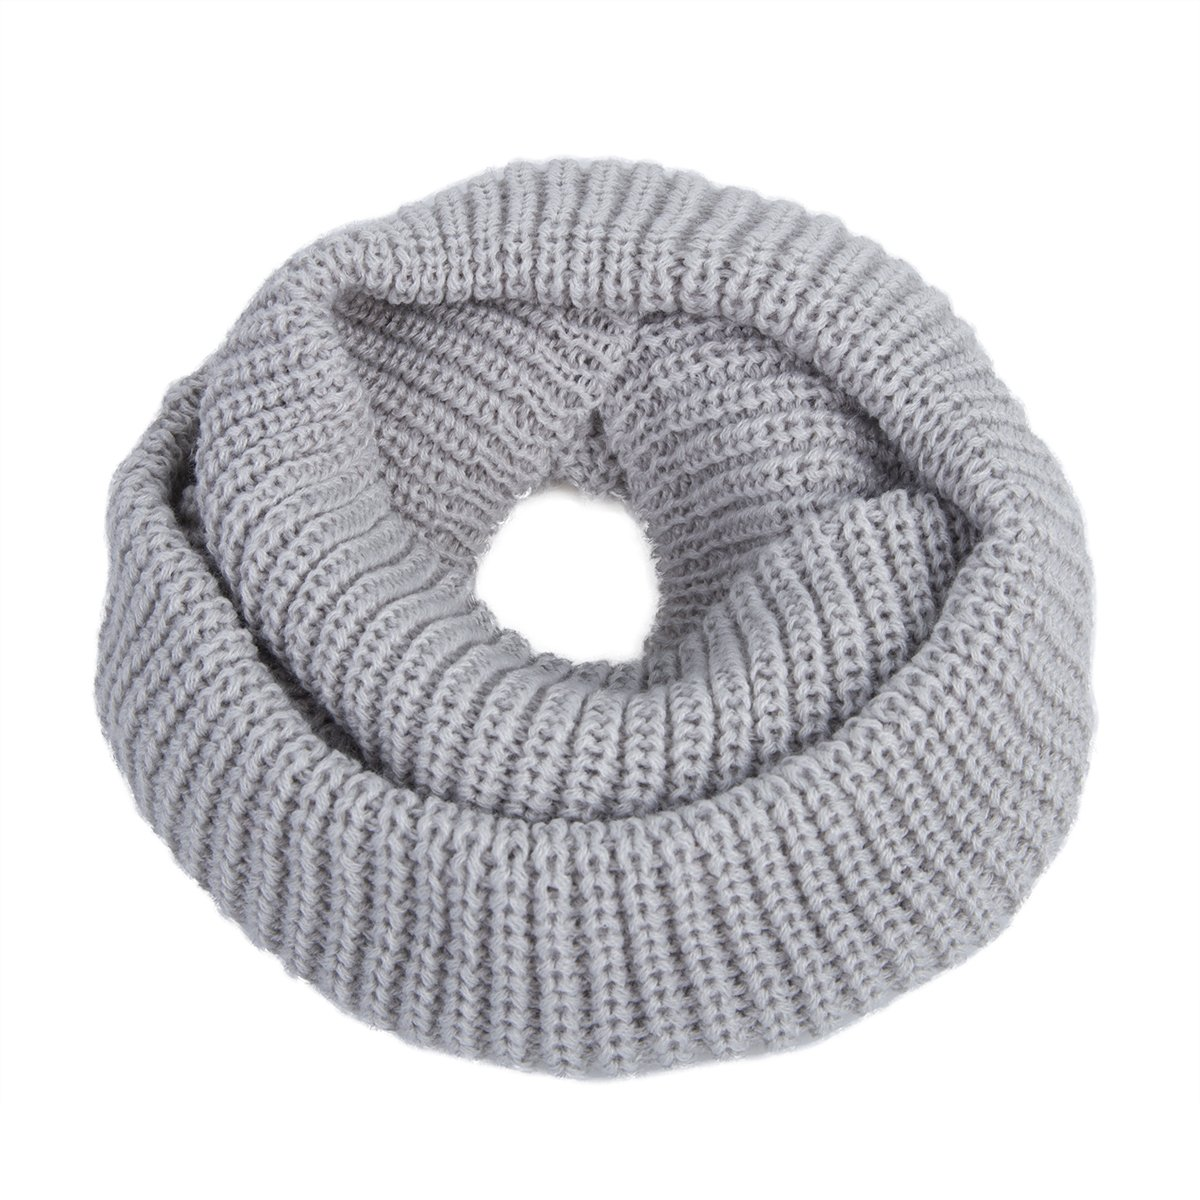 EVRFELAN Infinity Scarf Winter Warm Women Knit Circle Loop Scarves Accessories Grey Soft Neck Men Fashion Ribbed Cowl (Grey)